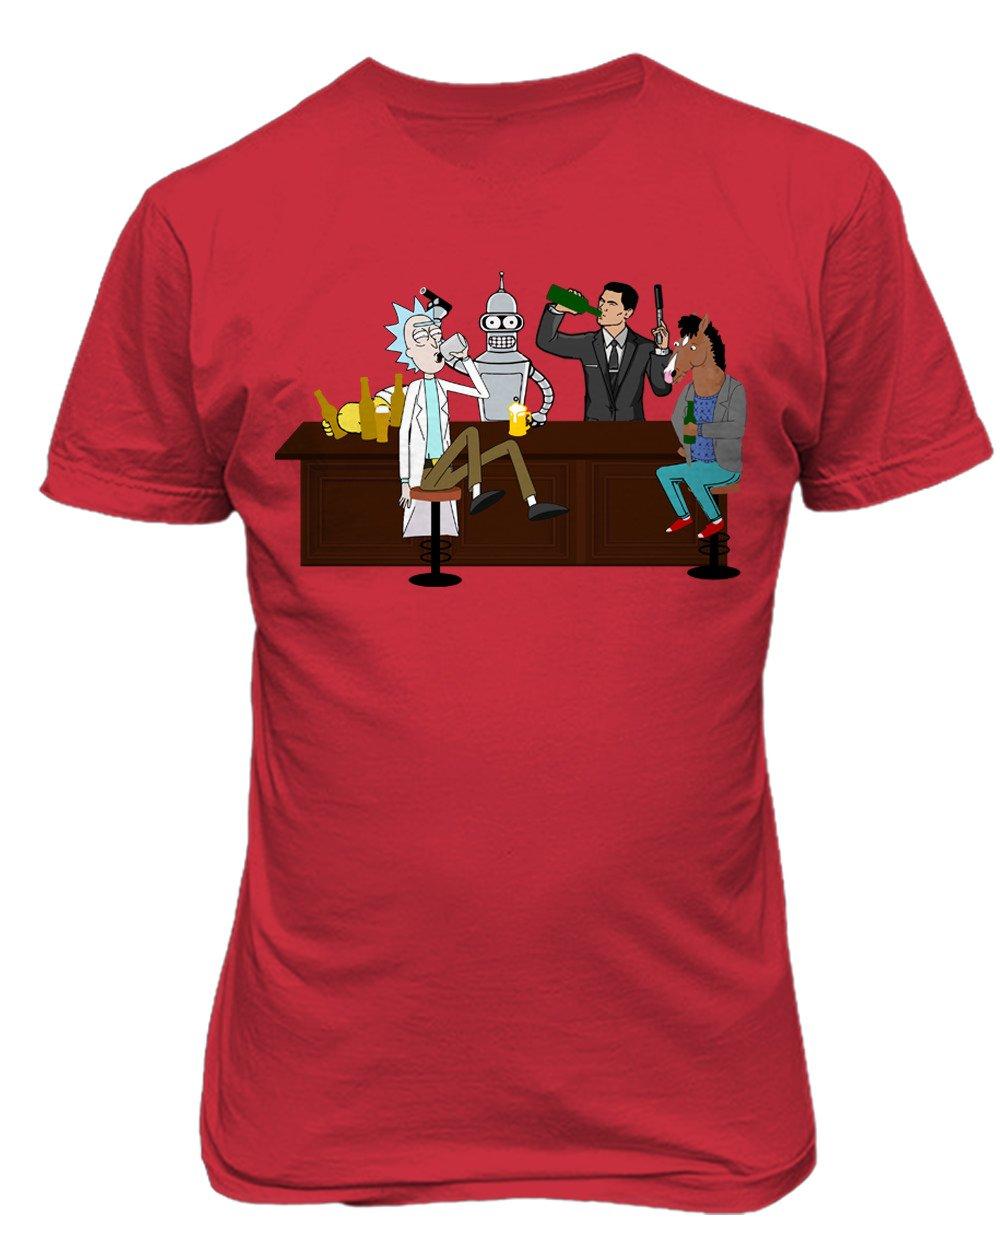 413d69991196d0 Amazon.com  KINGS SPORTS Drinking Buddies Rick Morty Premium Funny Men s T- Shirt  Sports   Outdoors